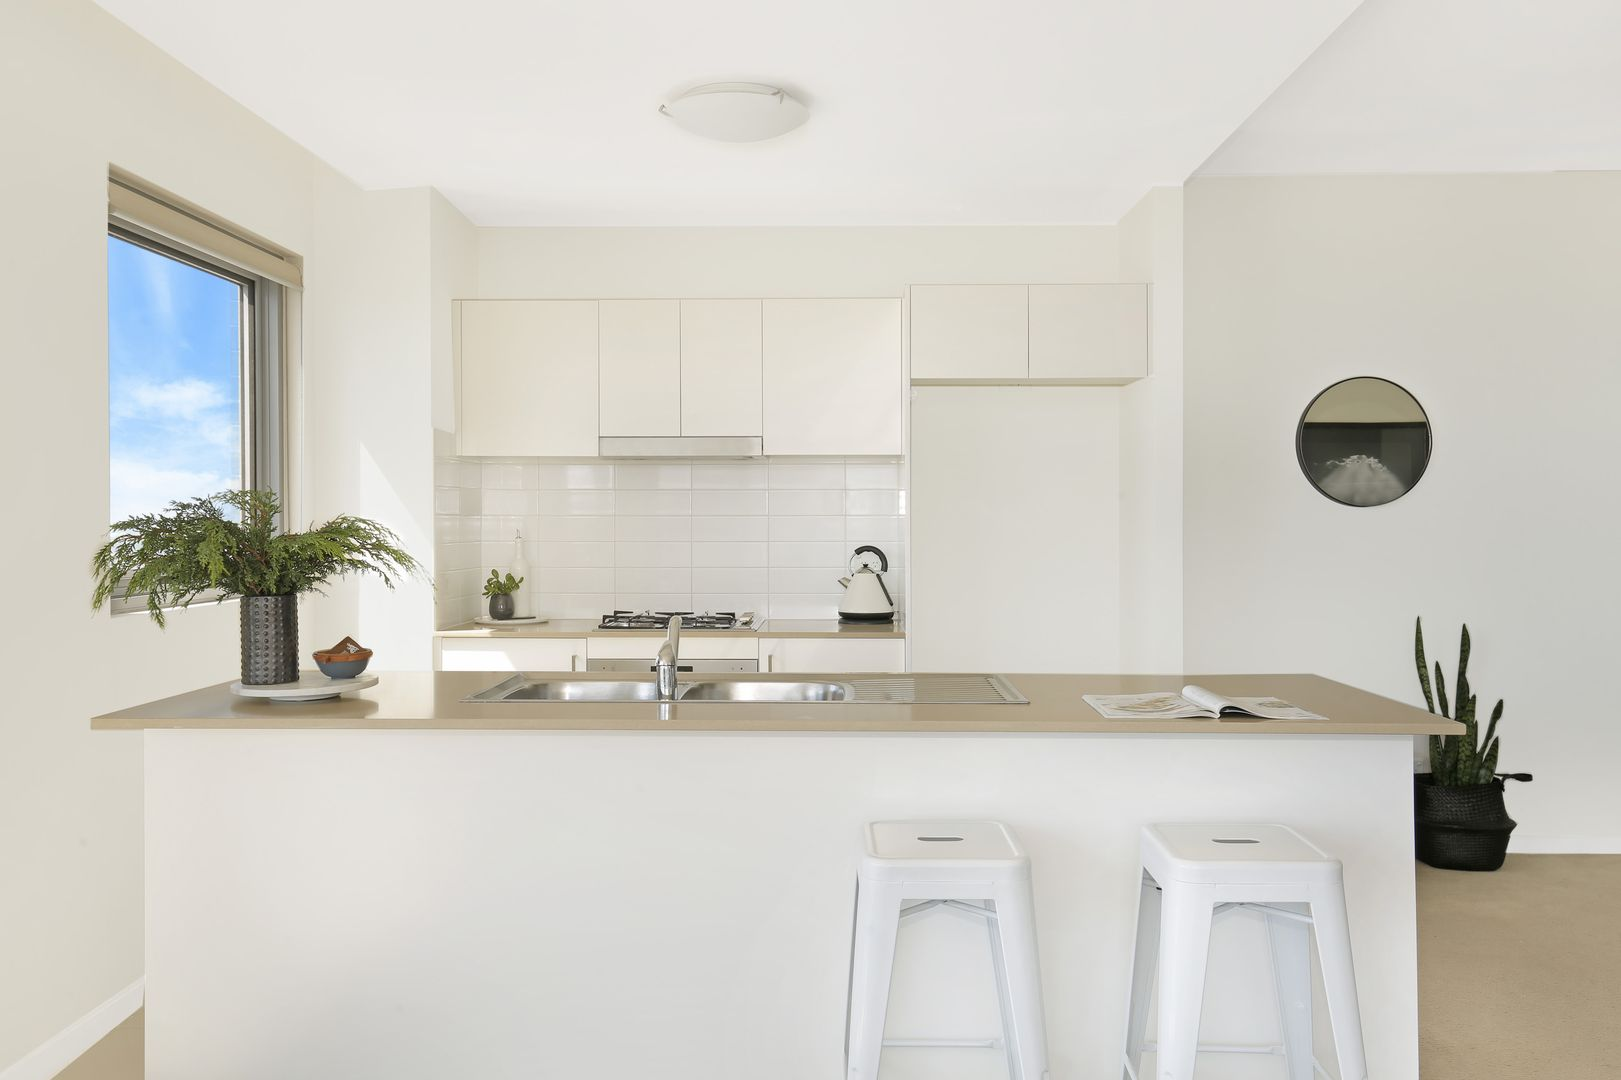 39/11 Atchison Street, Wollongong NSW 2500, Image 1